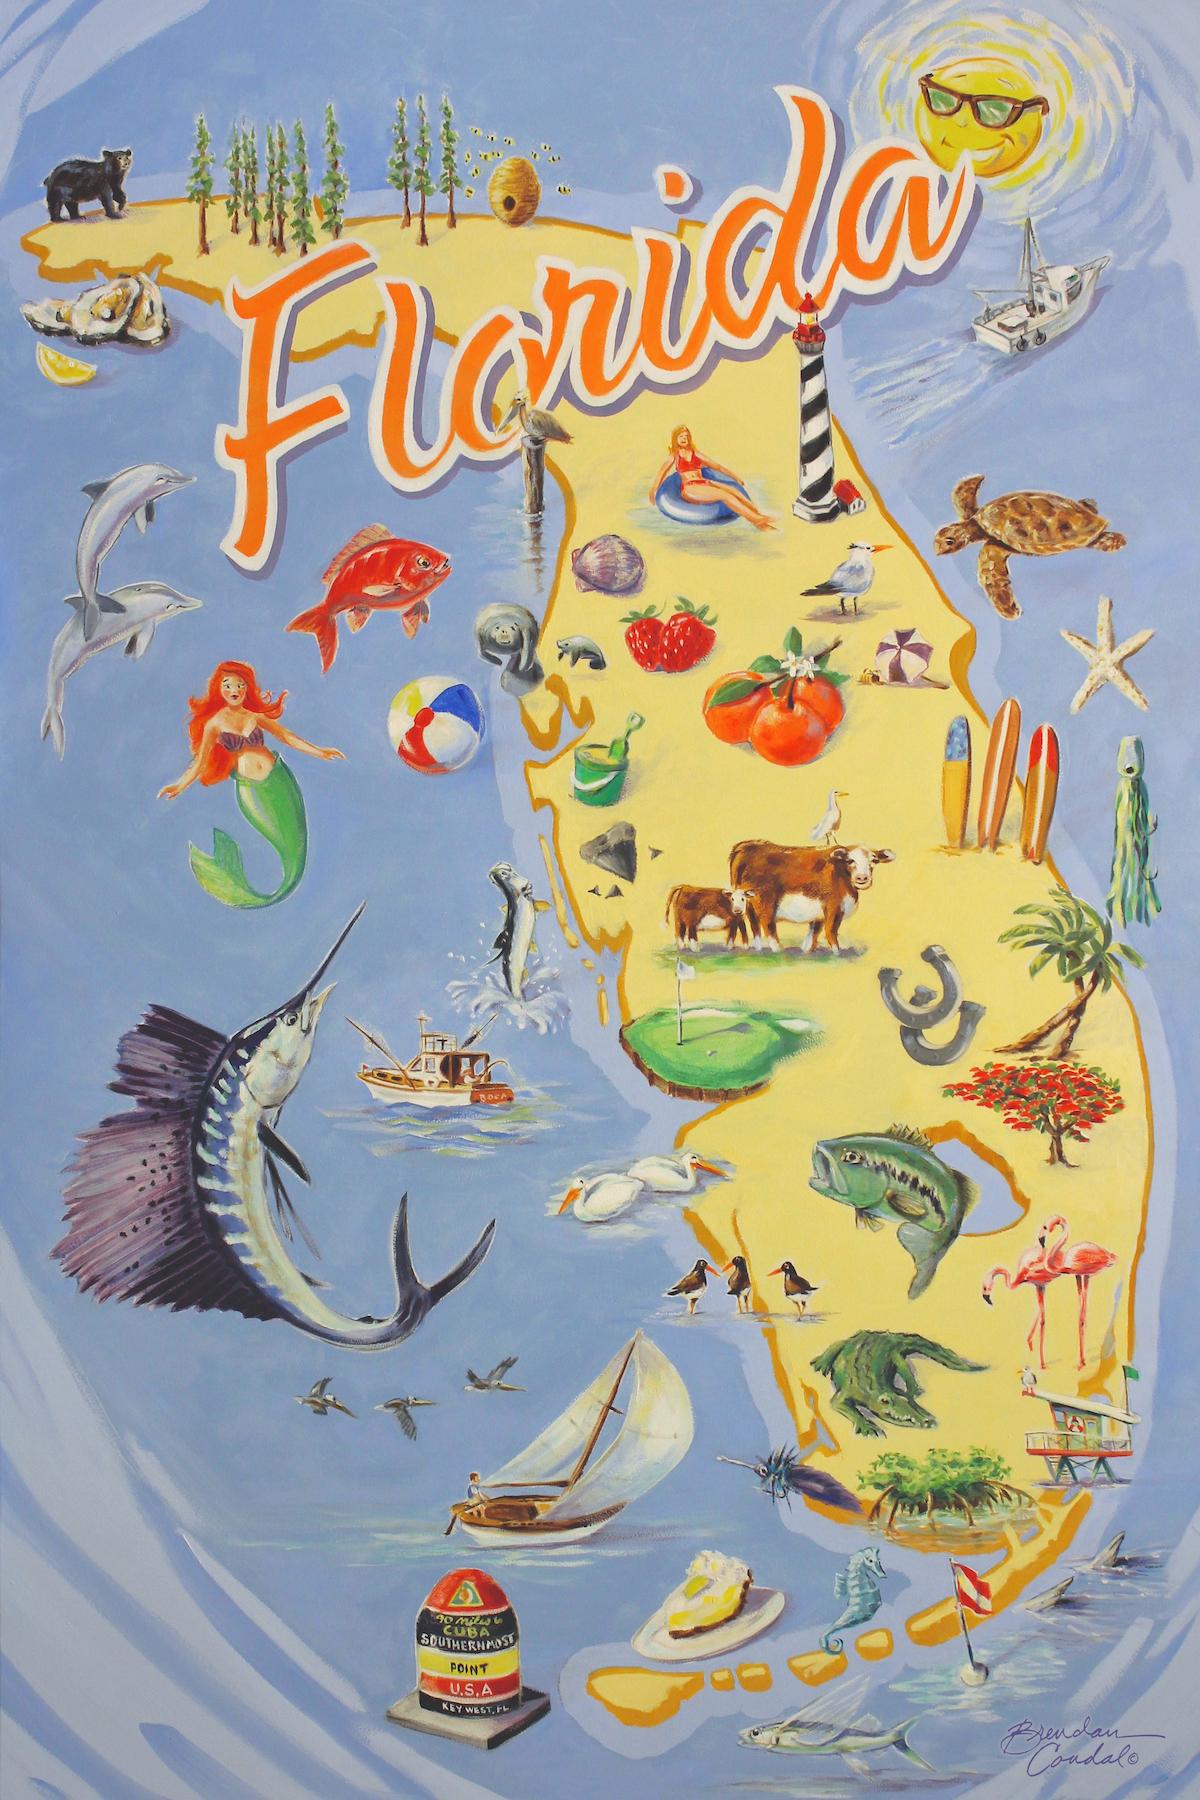 Vintage Florida Map | Brendan Coudal - Vintage Florida Map Poster